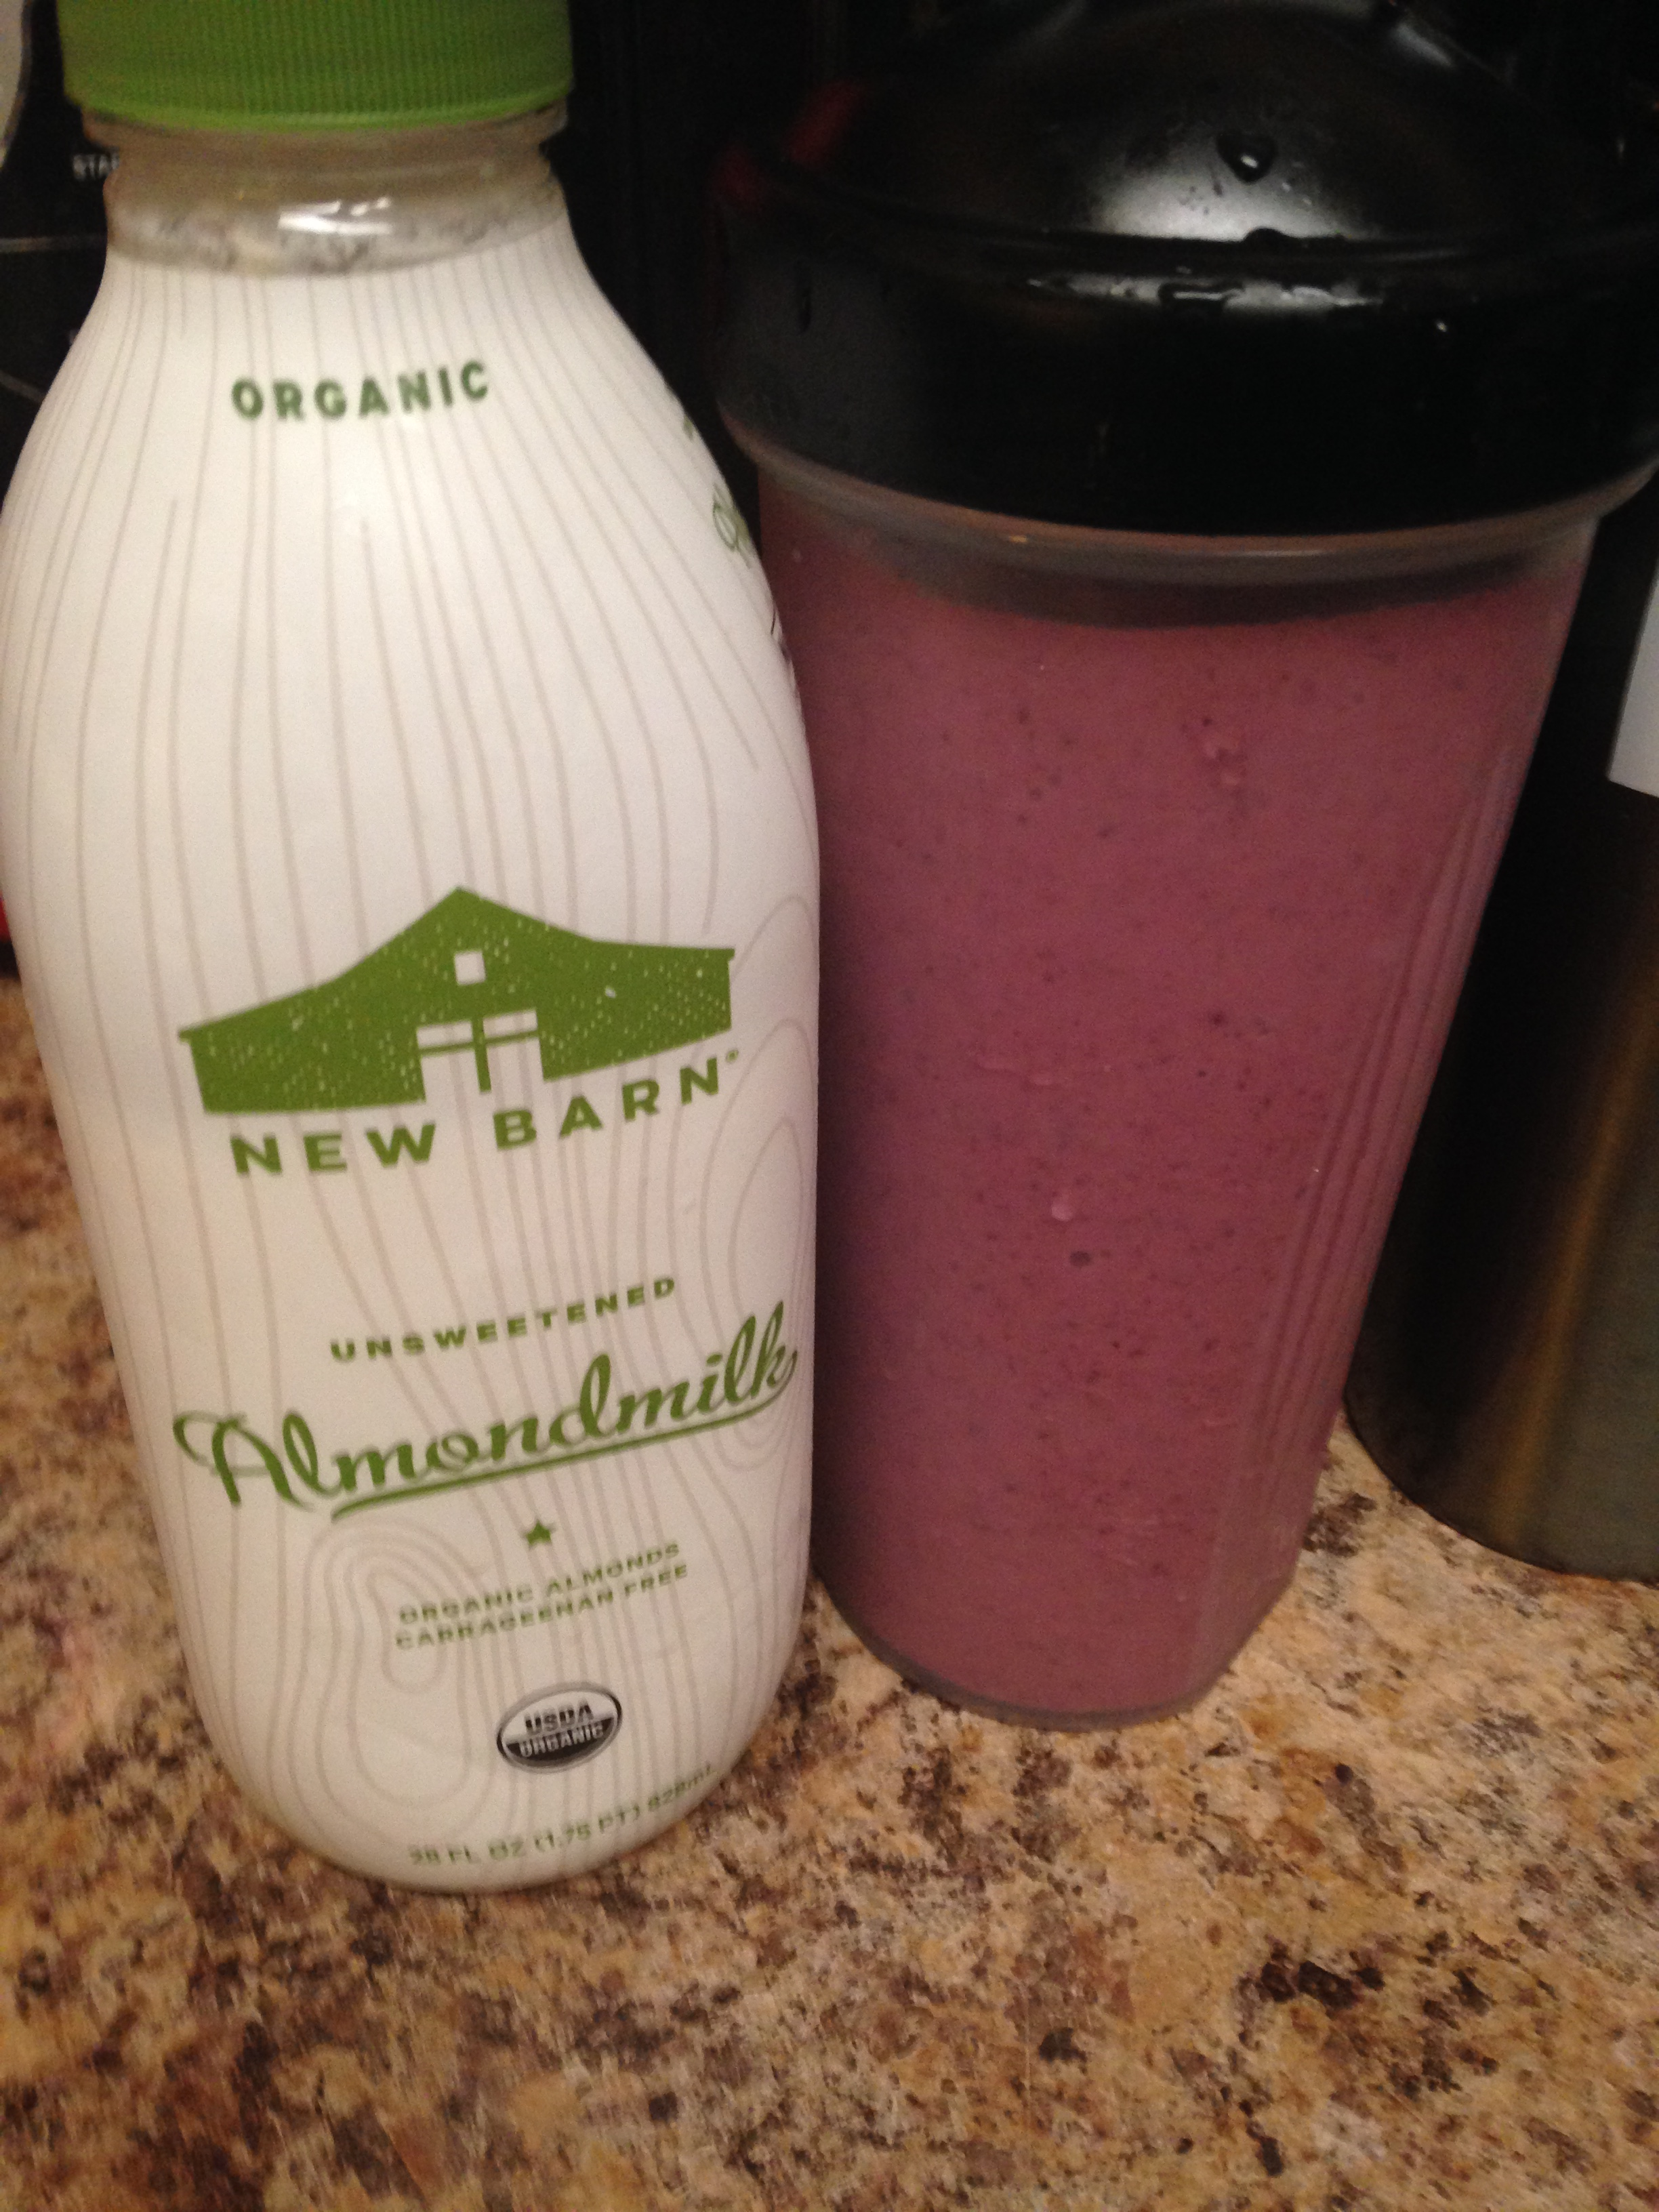 About New Barn Almondmilk